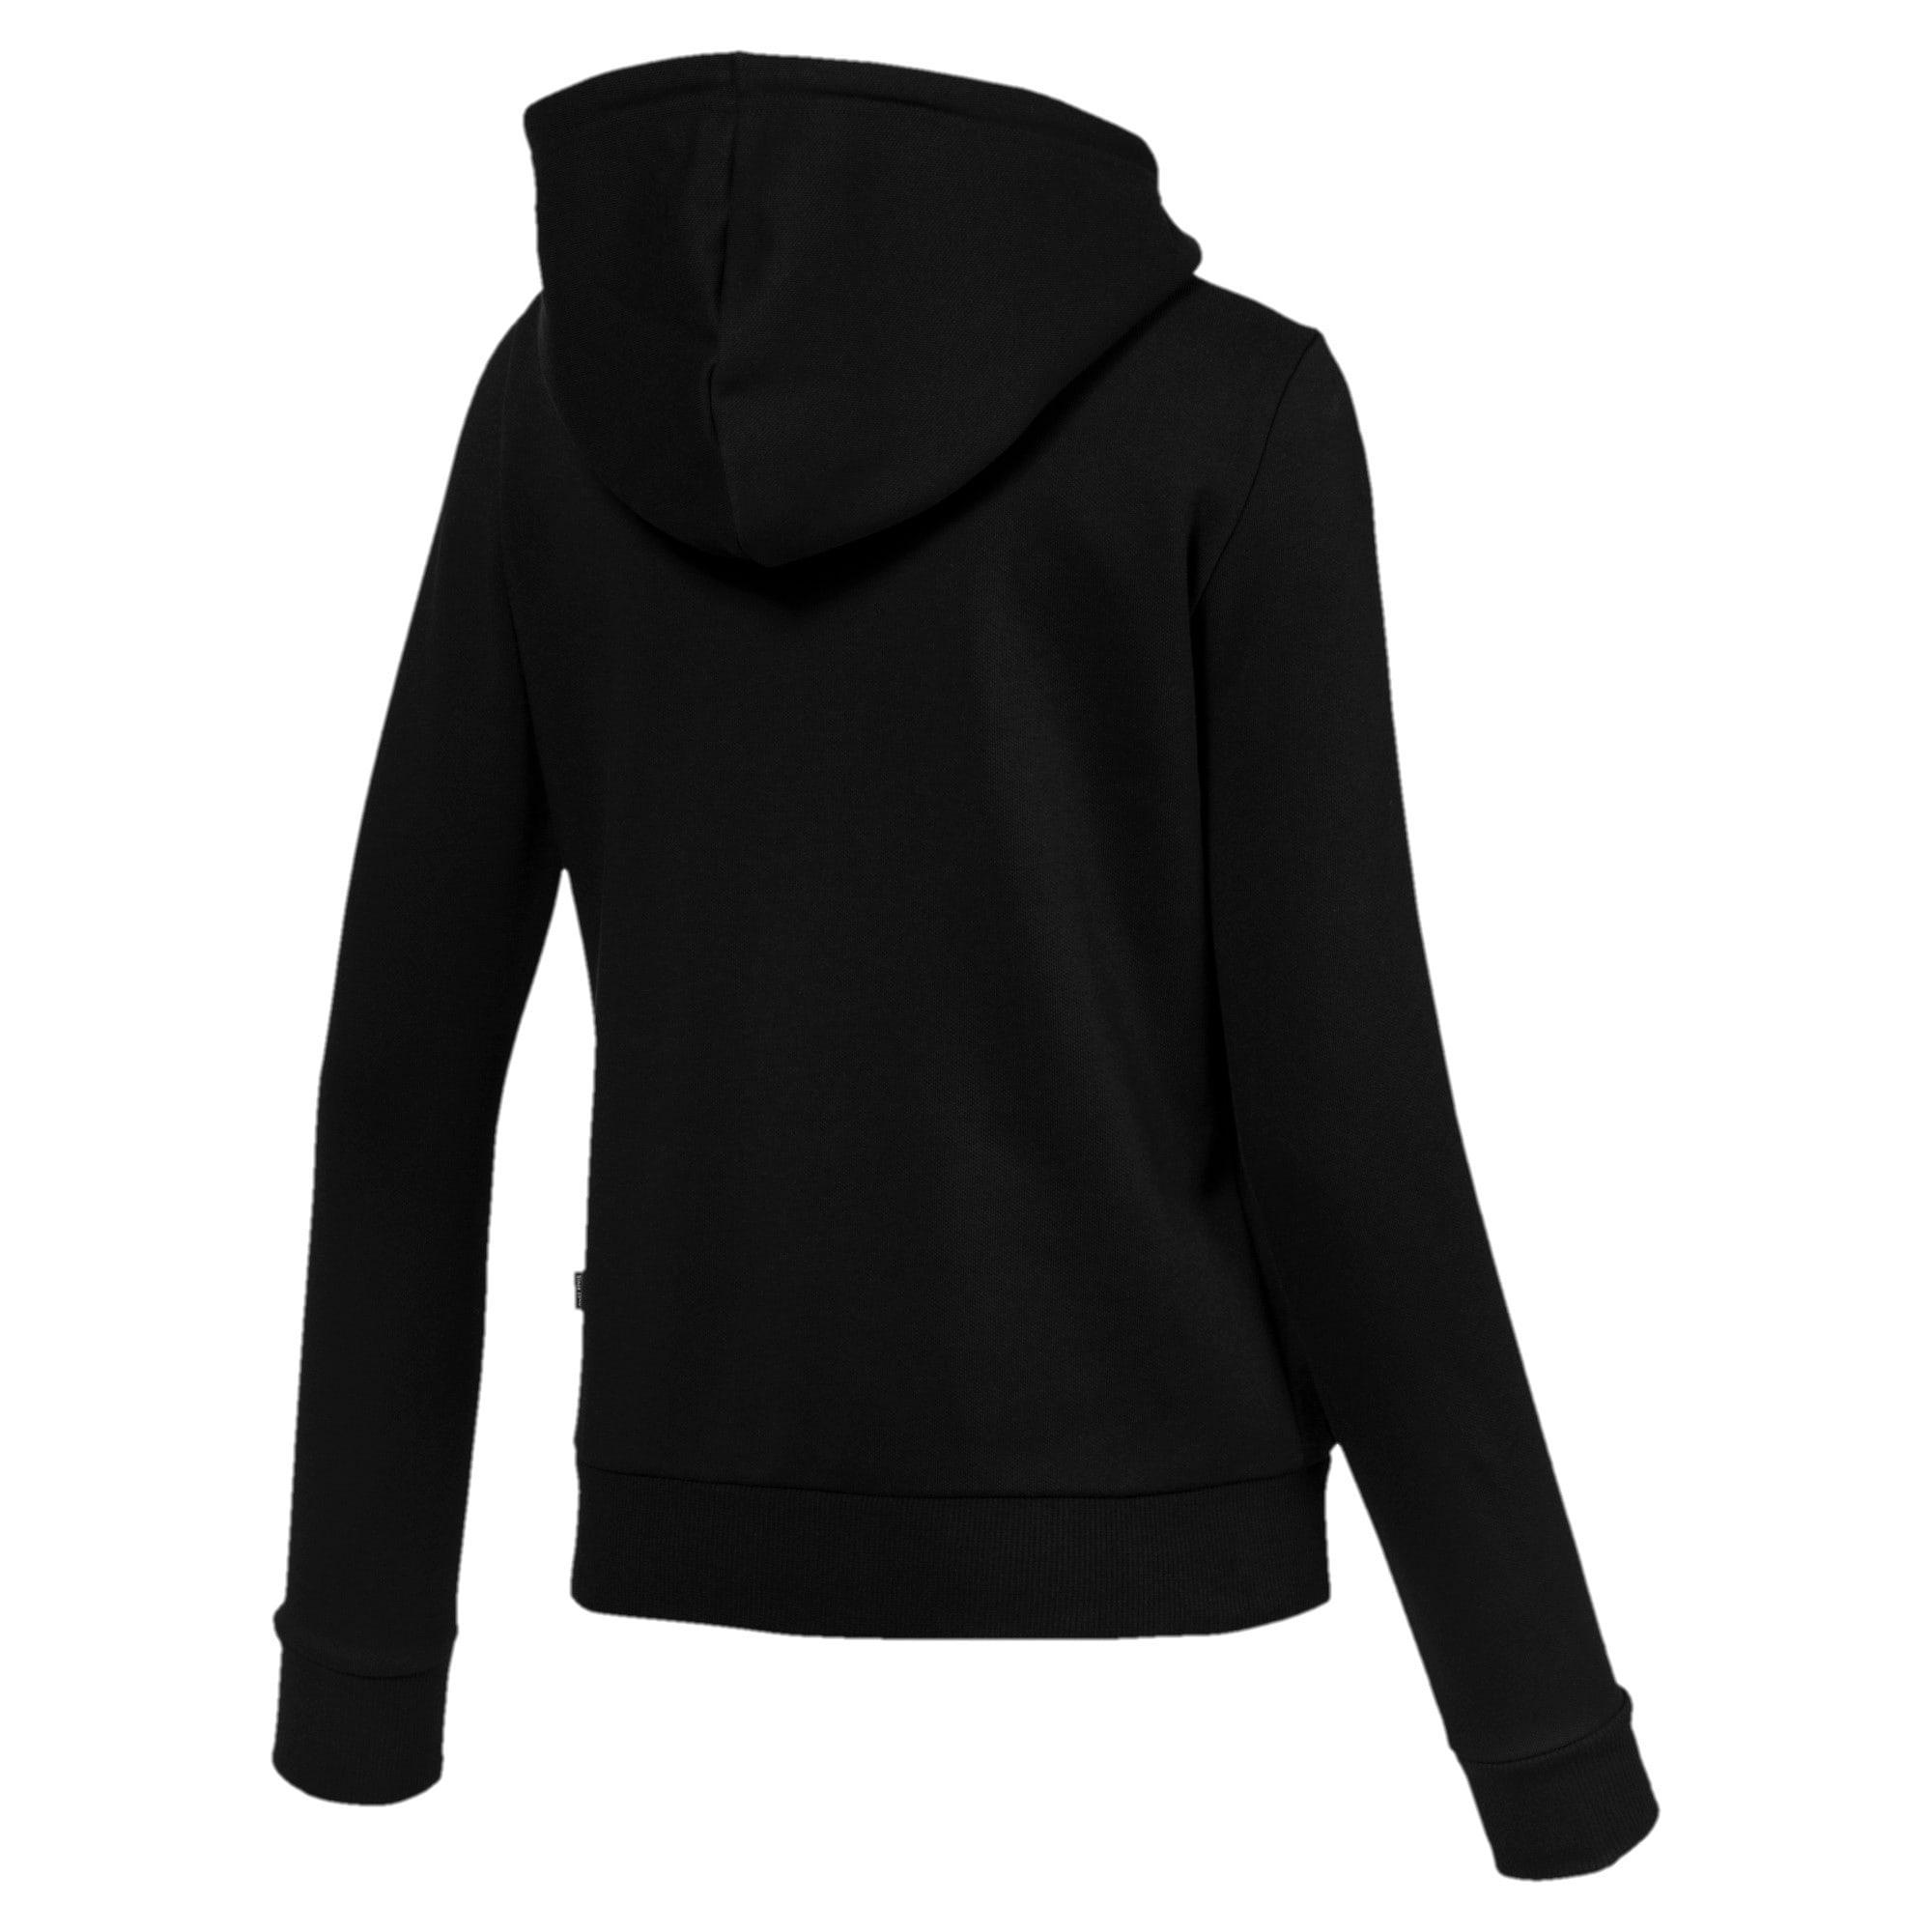 Thumbnail 2 of Essentials Damen Fleece Sweatjacke mit Kapuze, Cotton Black, medium